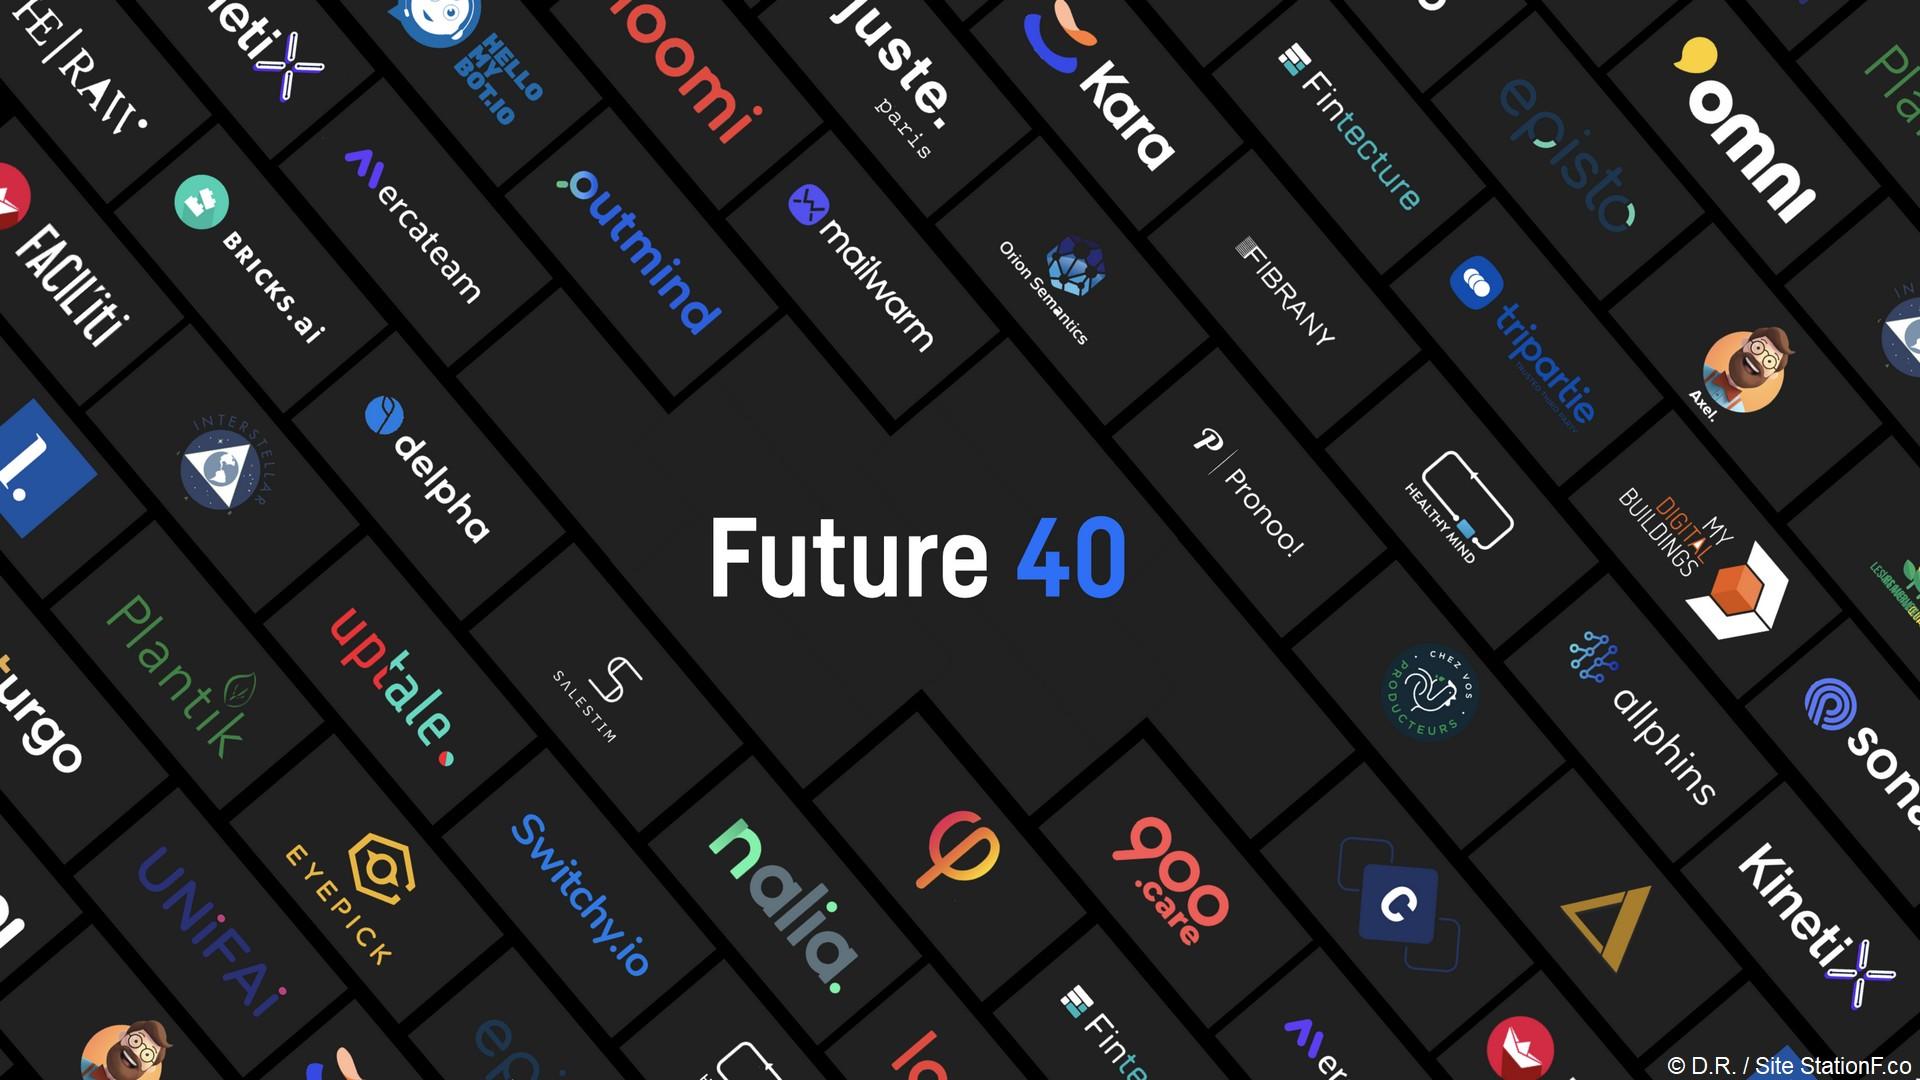 Station F – Future 40 (1) Logo